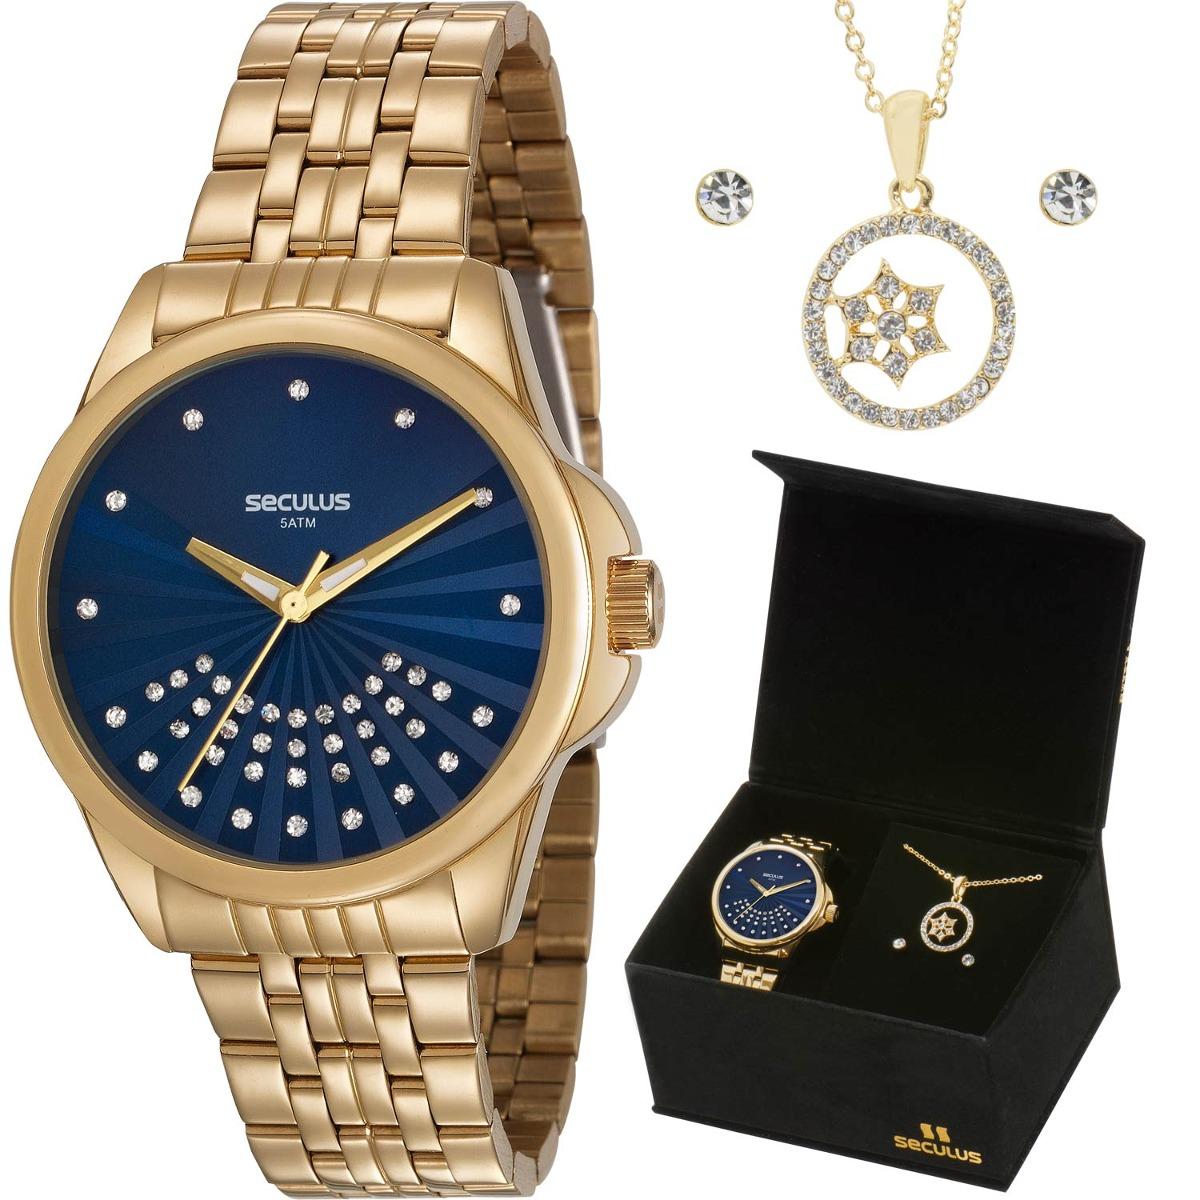 f1a59b54aca kit relógio seculus feminino colar e brincos 20599lpsvds2k1. Carregando  zoom.